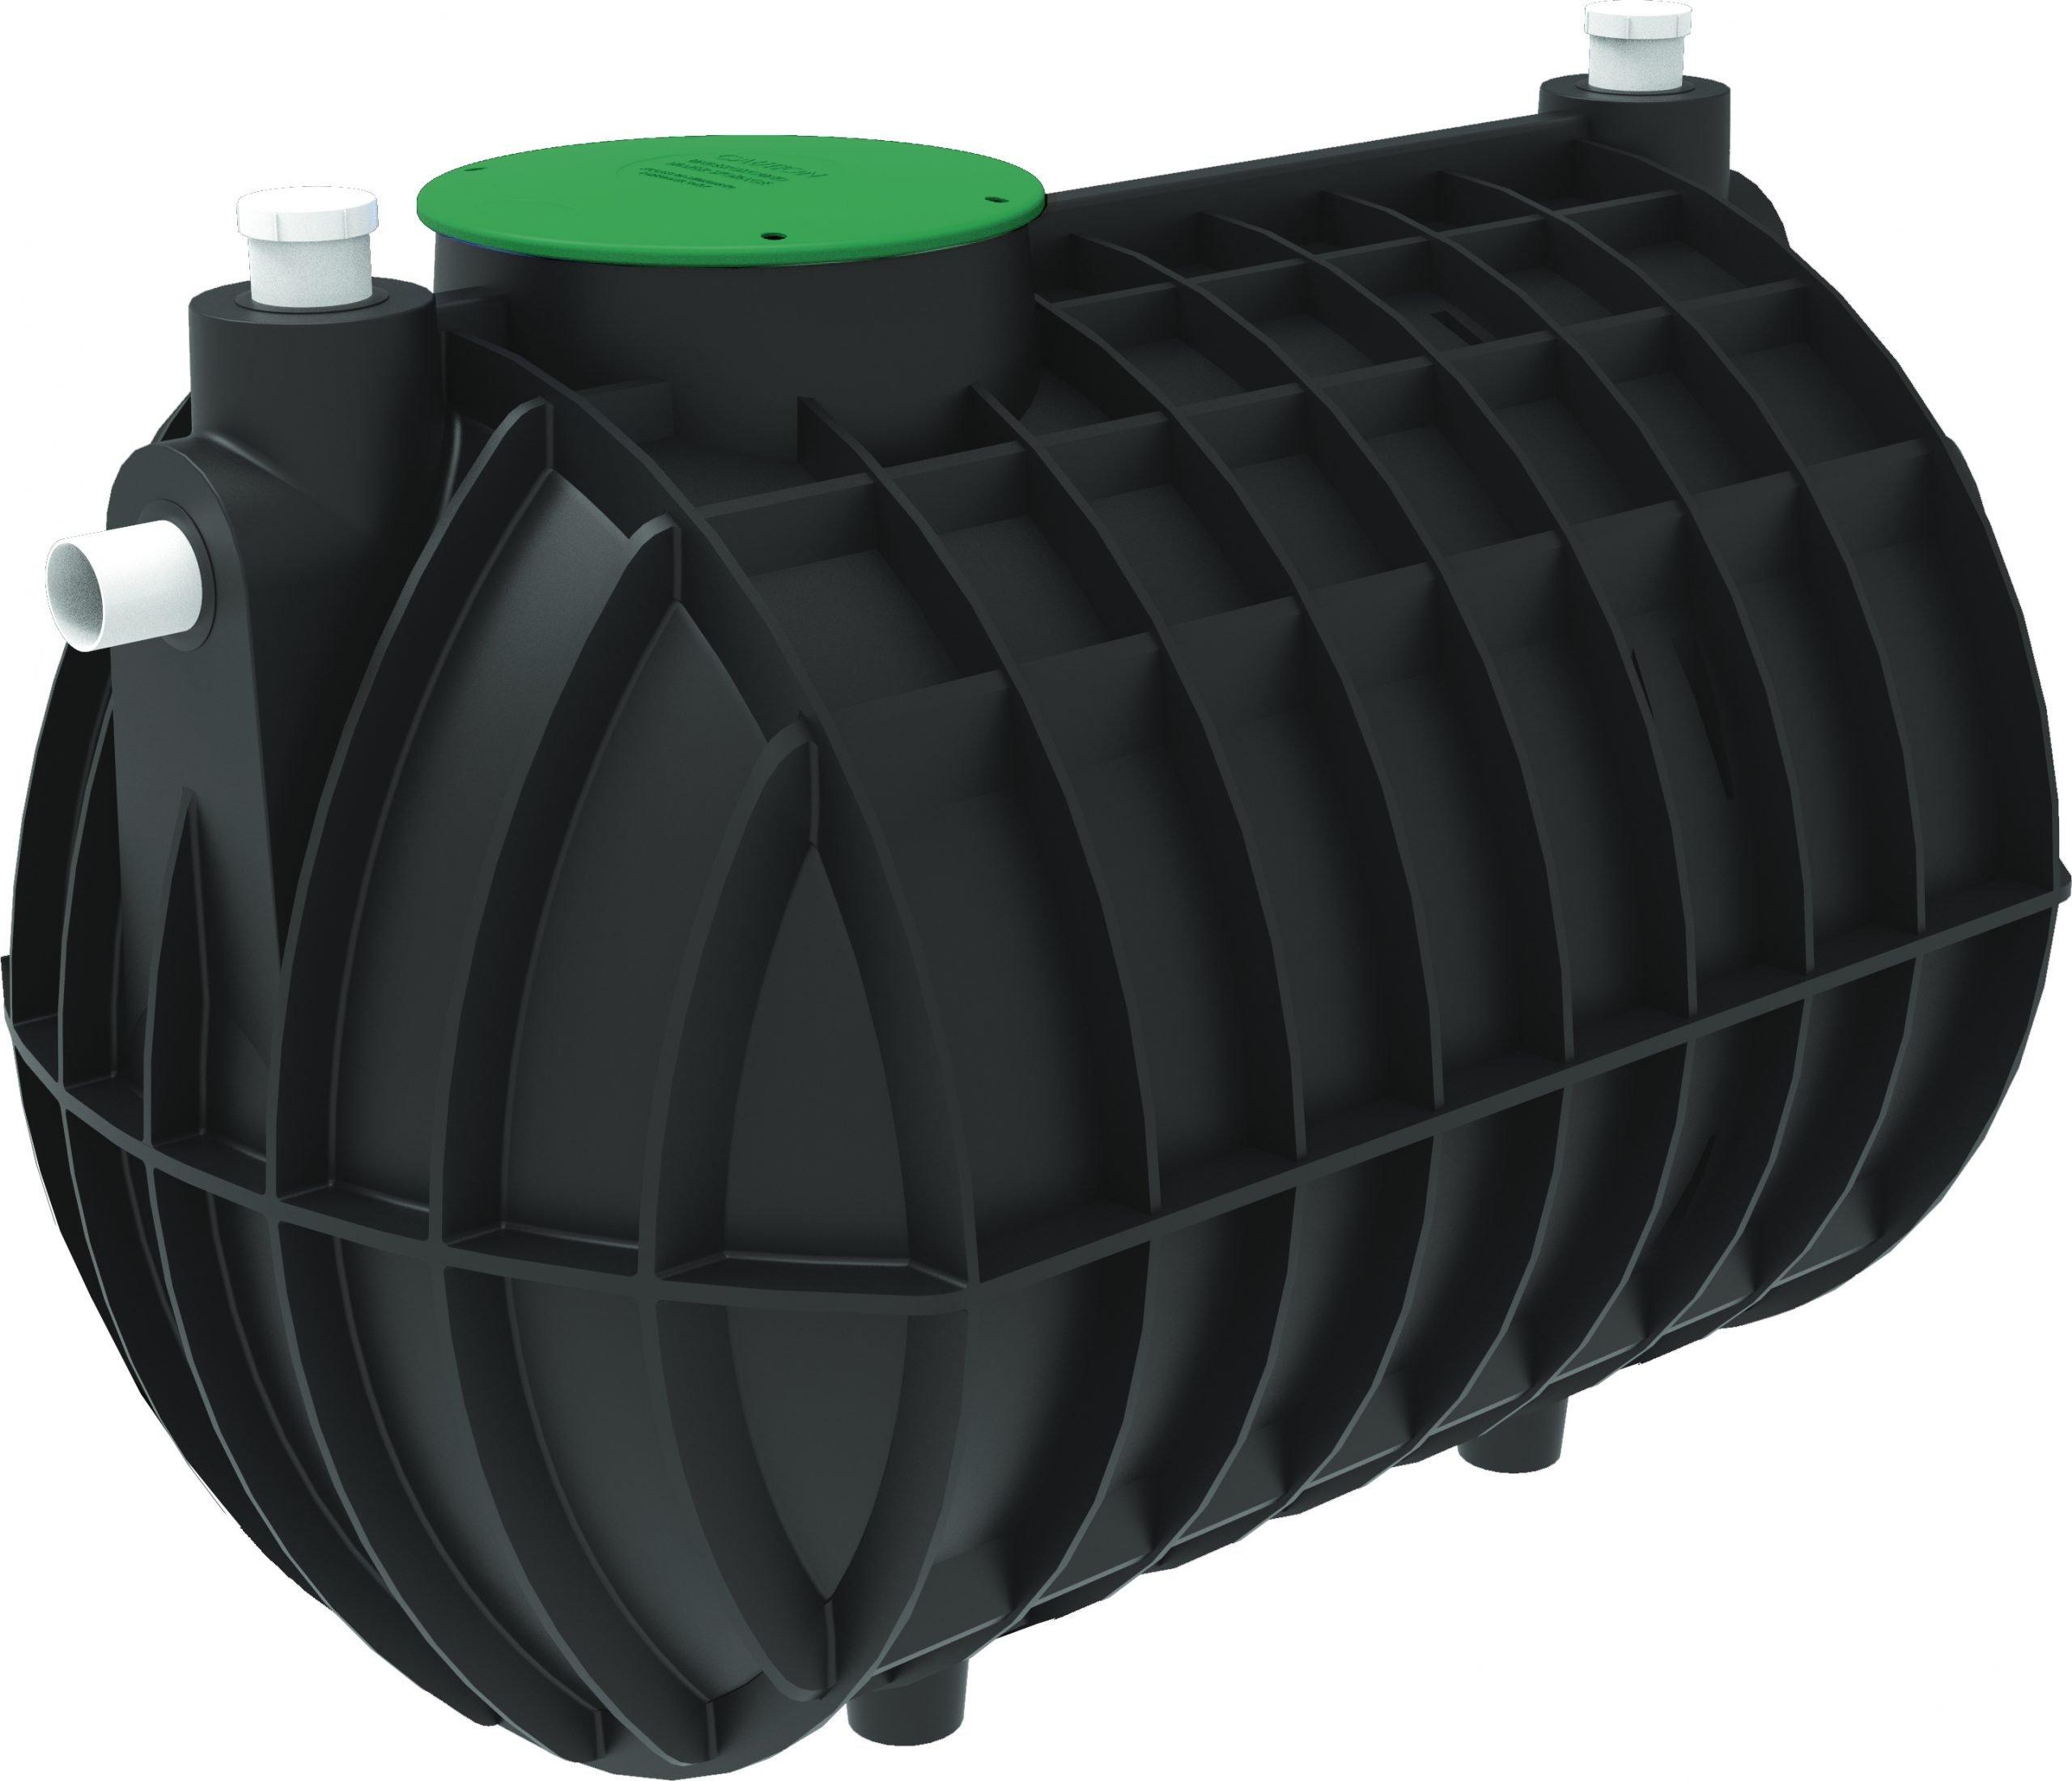 Polymaster ST3100 Septic Tank